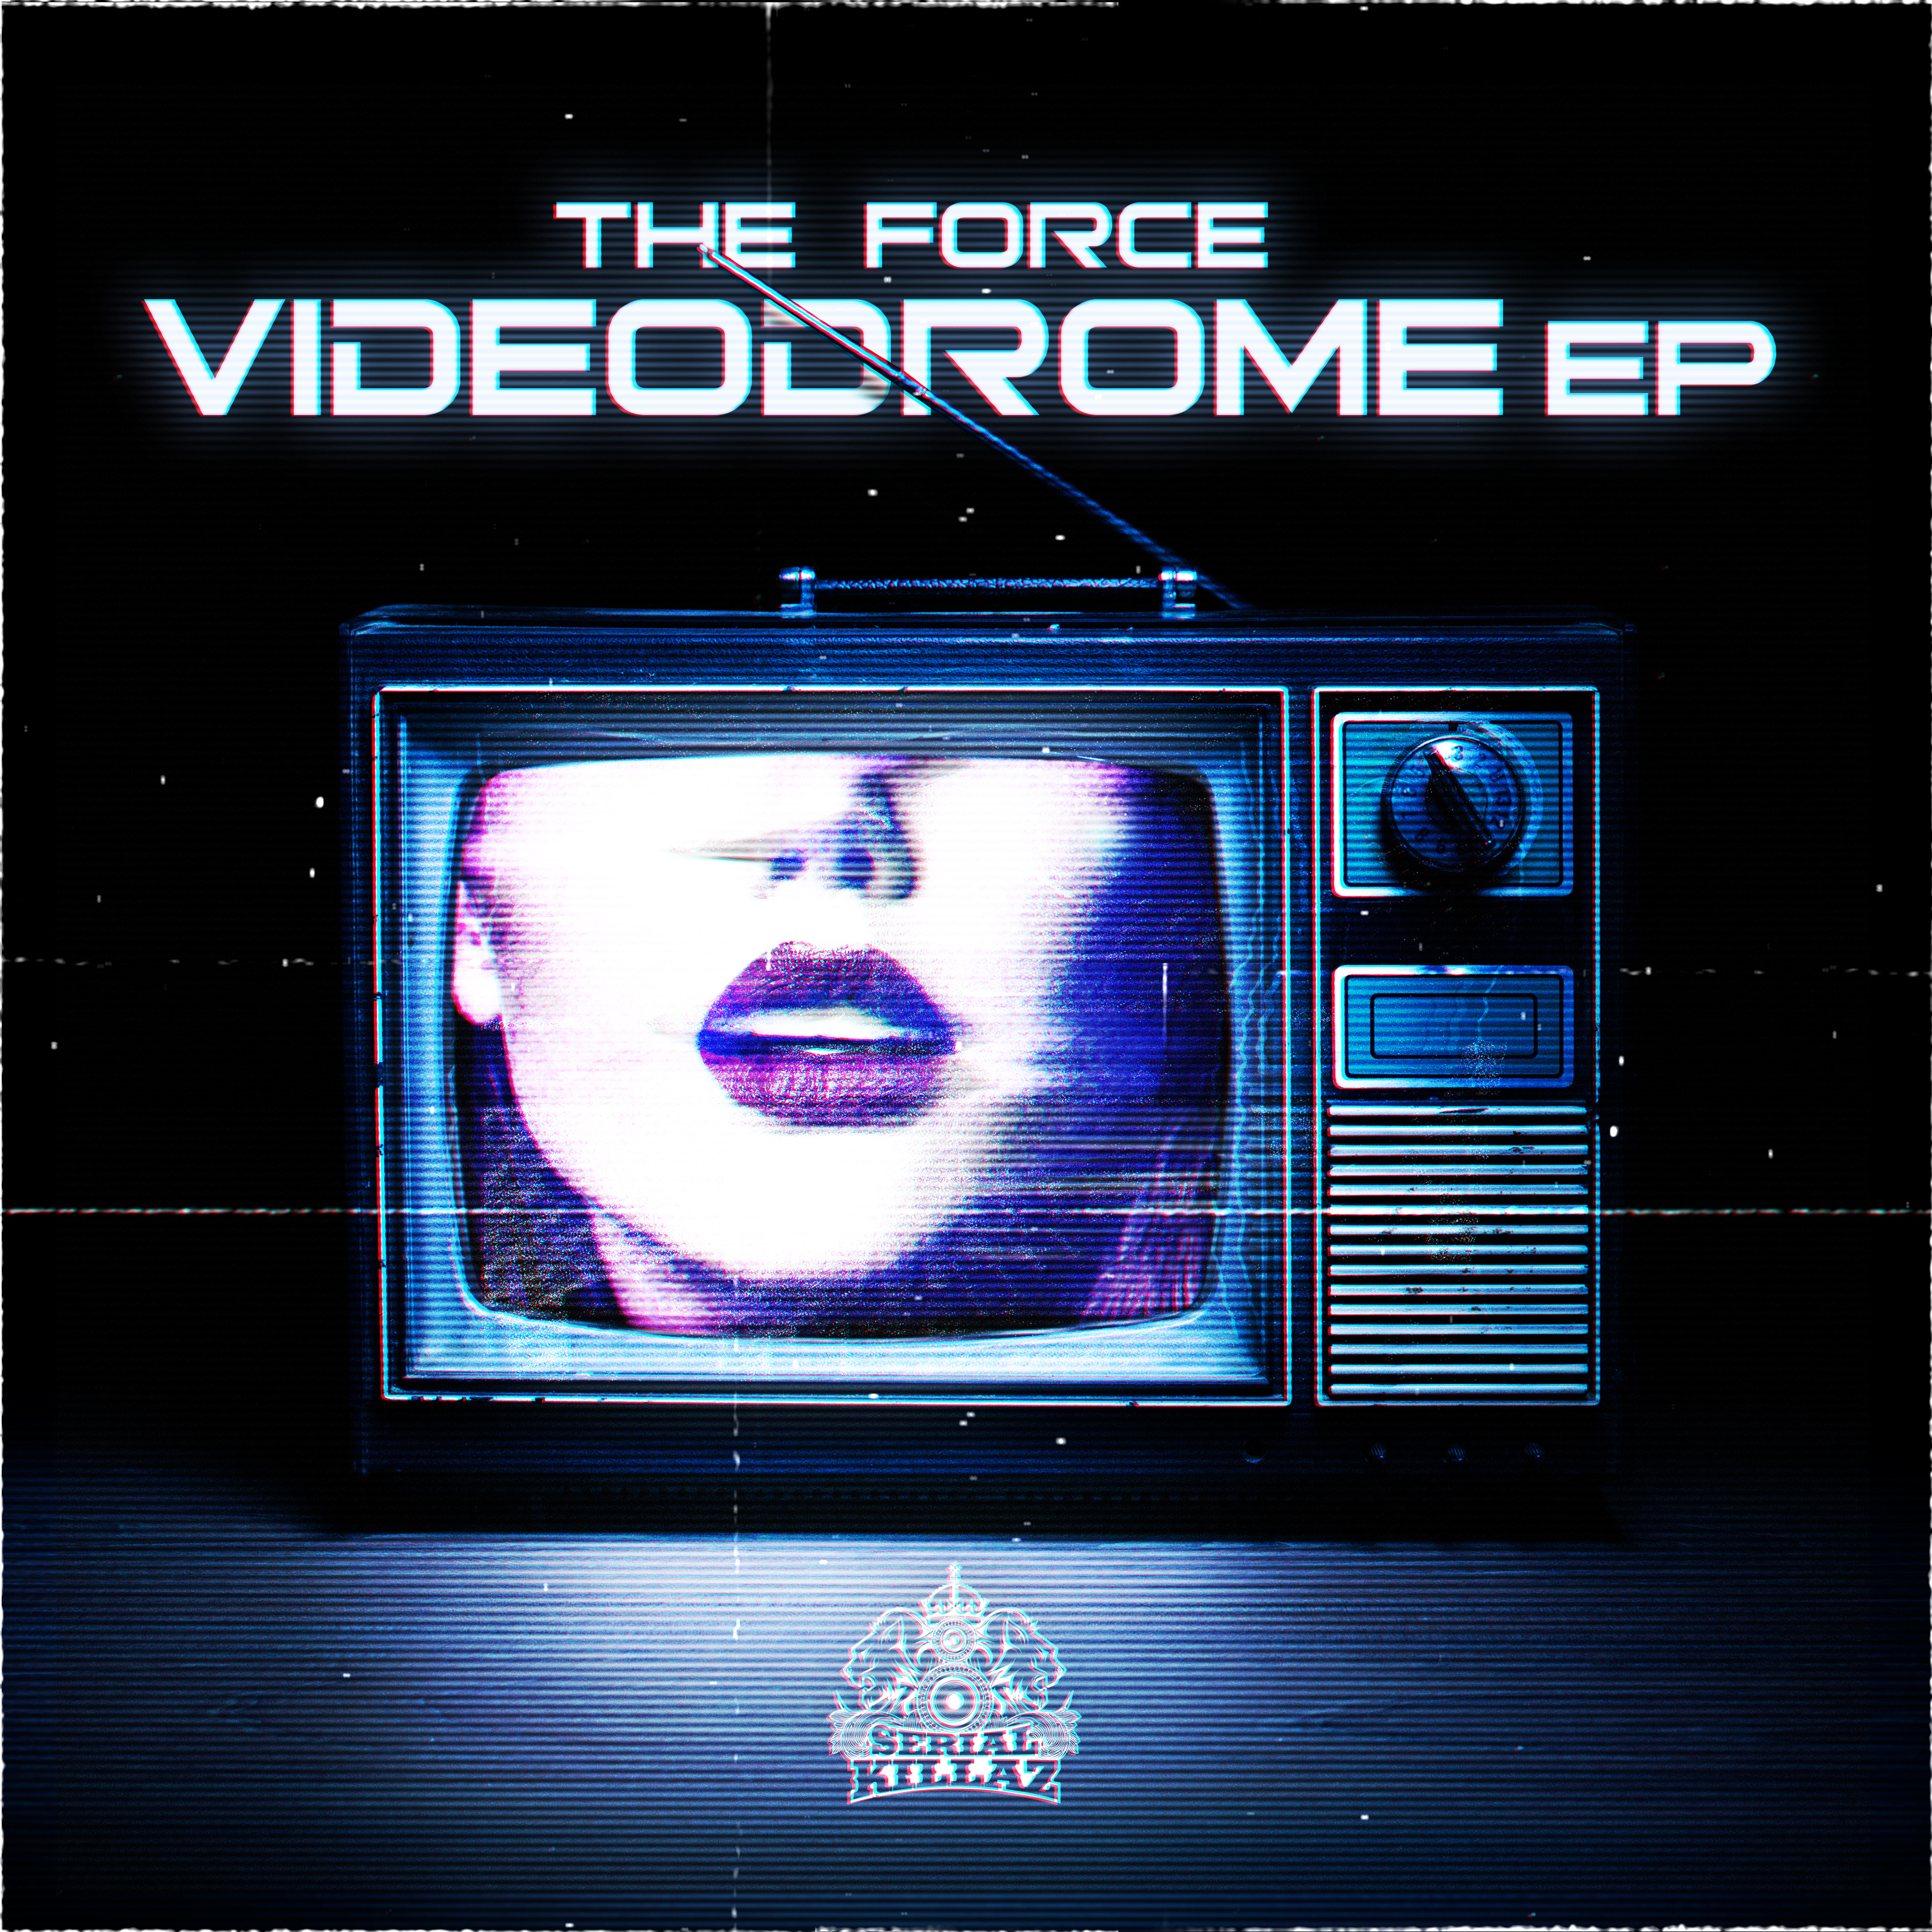 The Force - Videodrome EP - Serial Killaz